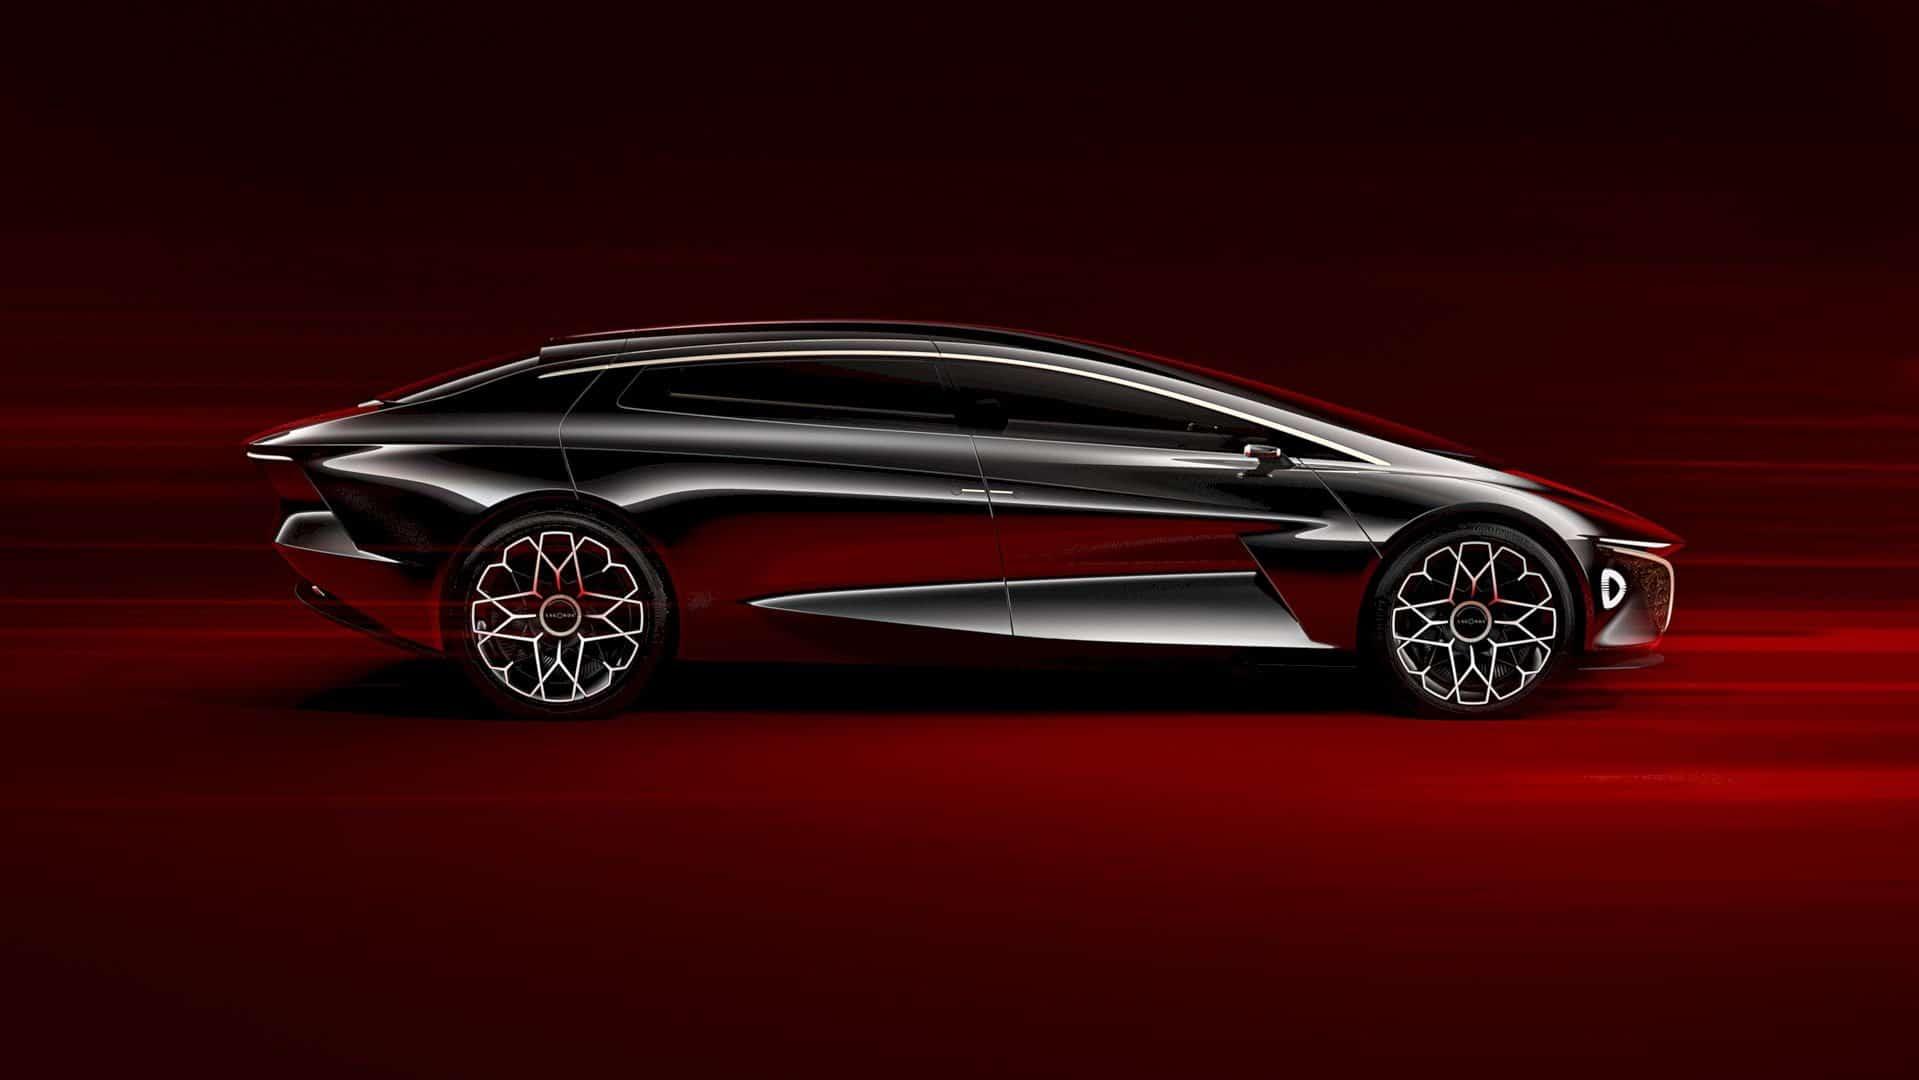 Lagonda Vision Concept by Aston Martin: The Stunning EV